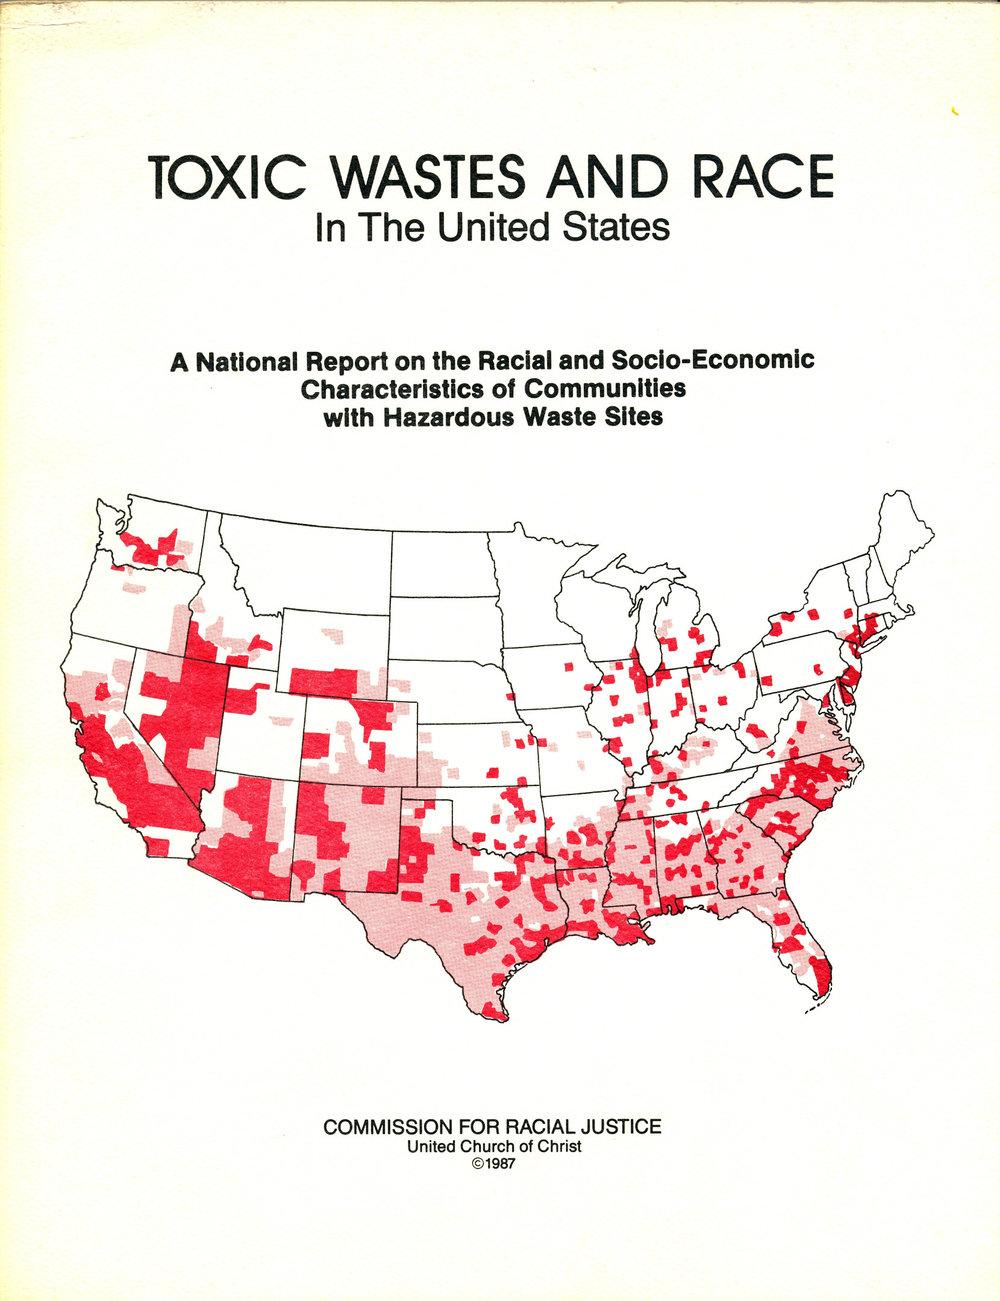 Toxic Wastes and Race.JPG